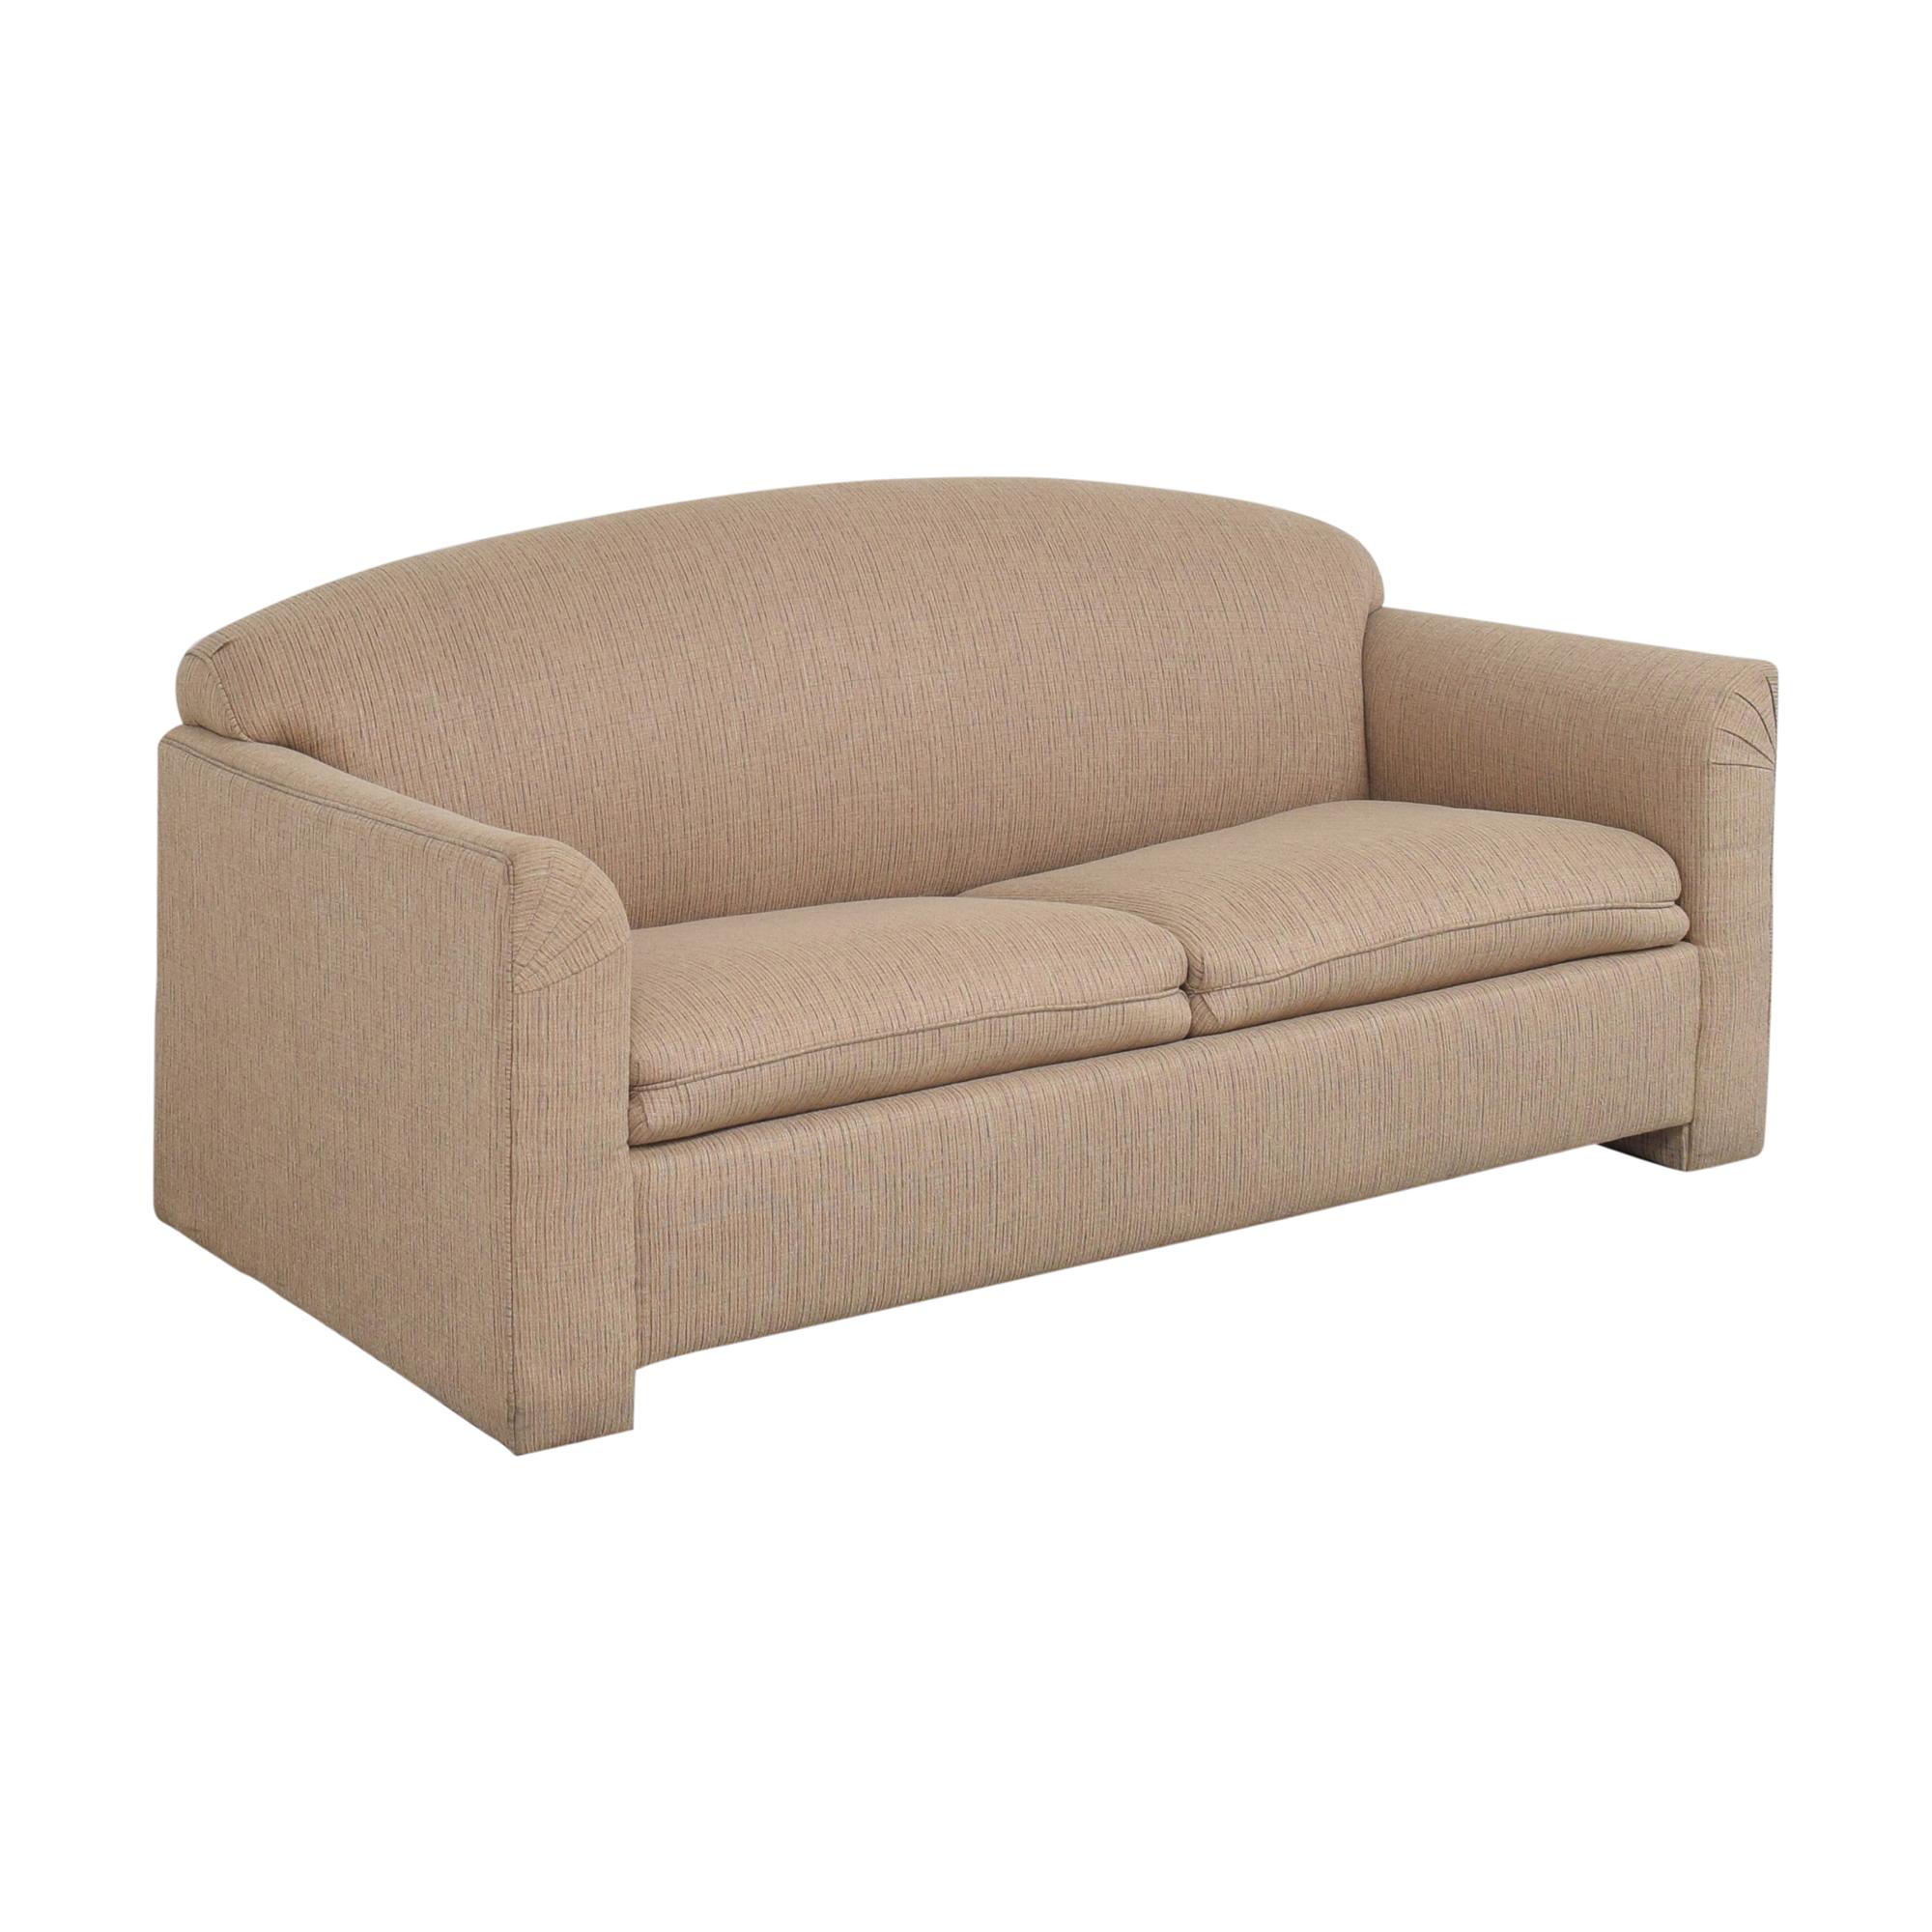 Simmons Simmons Two Cushion Sleeper Sofa Sofas